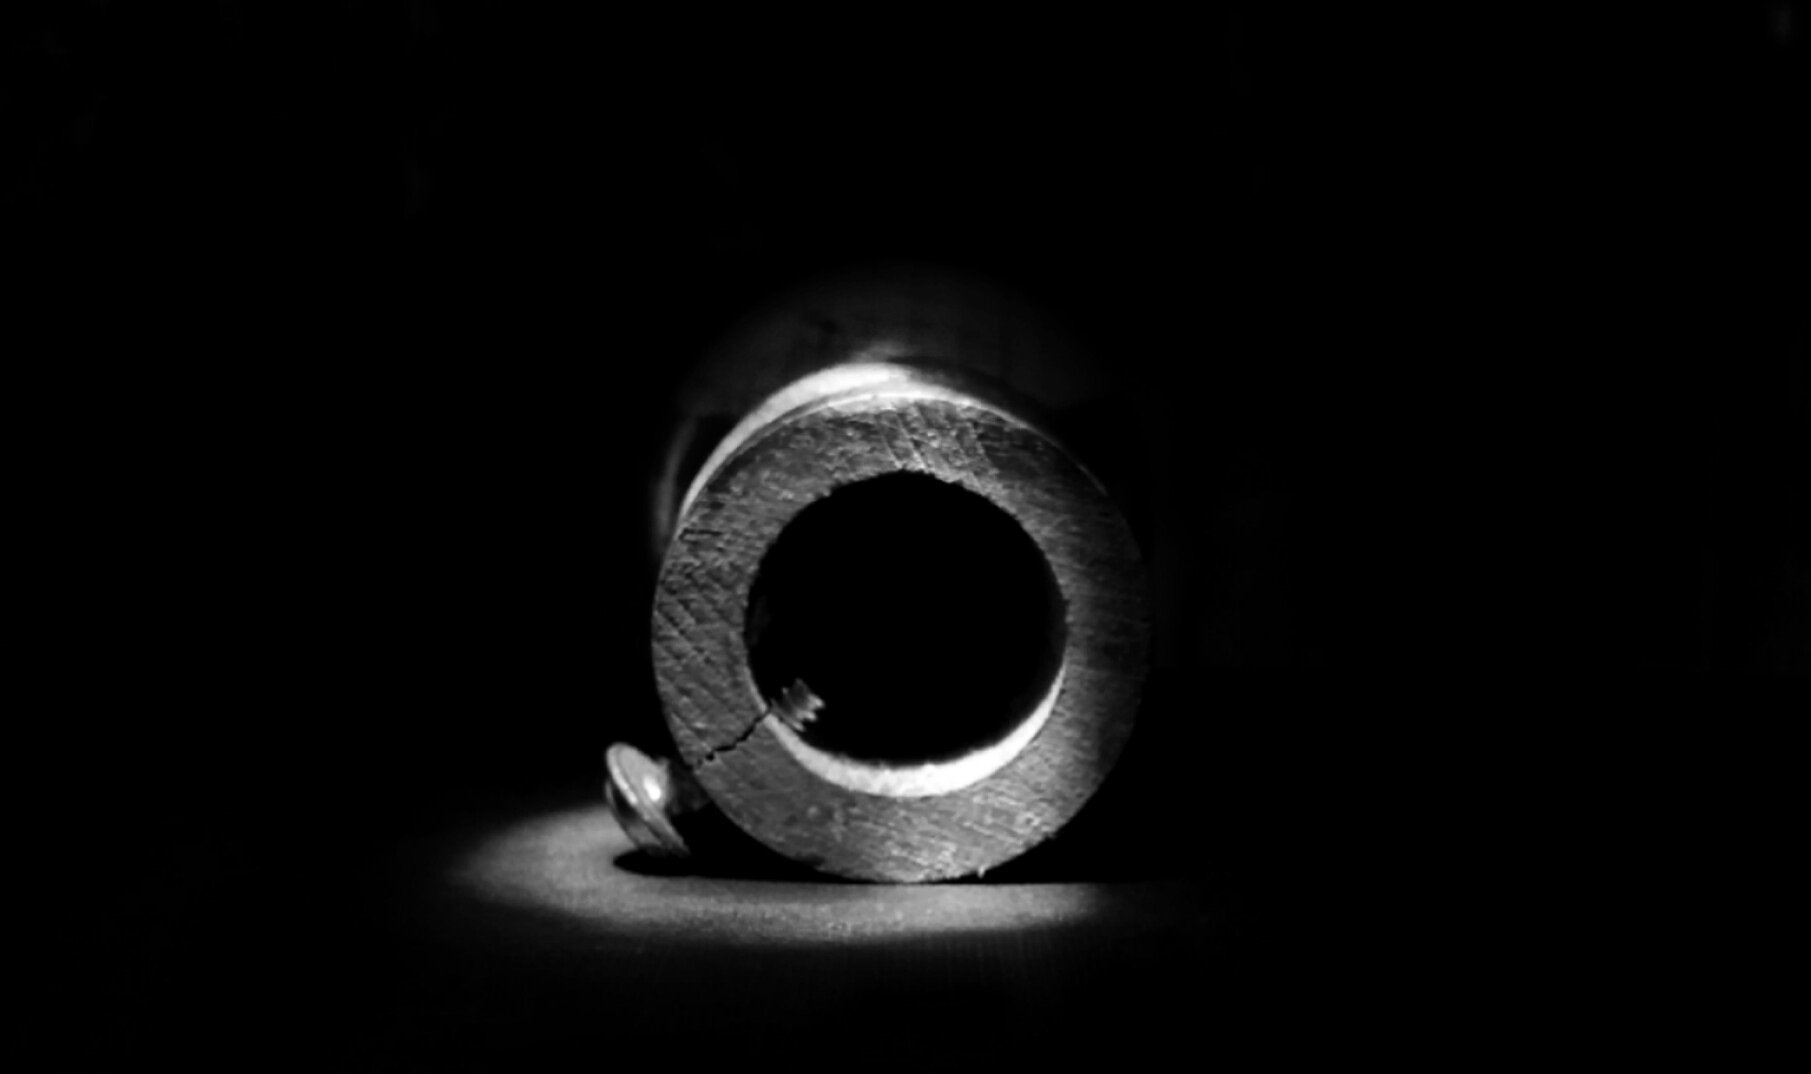 I owe Dark !  - Mobile Photography  by MONOJIT NANDI